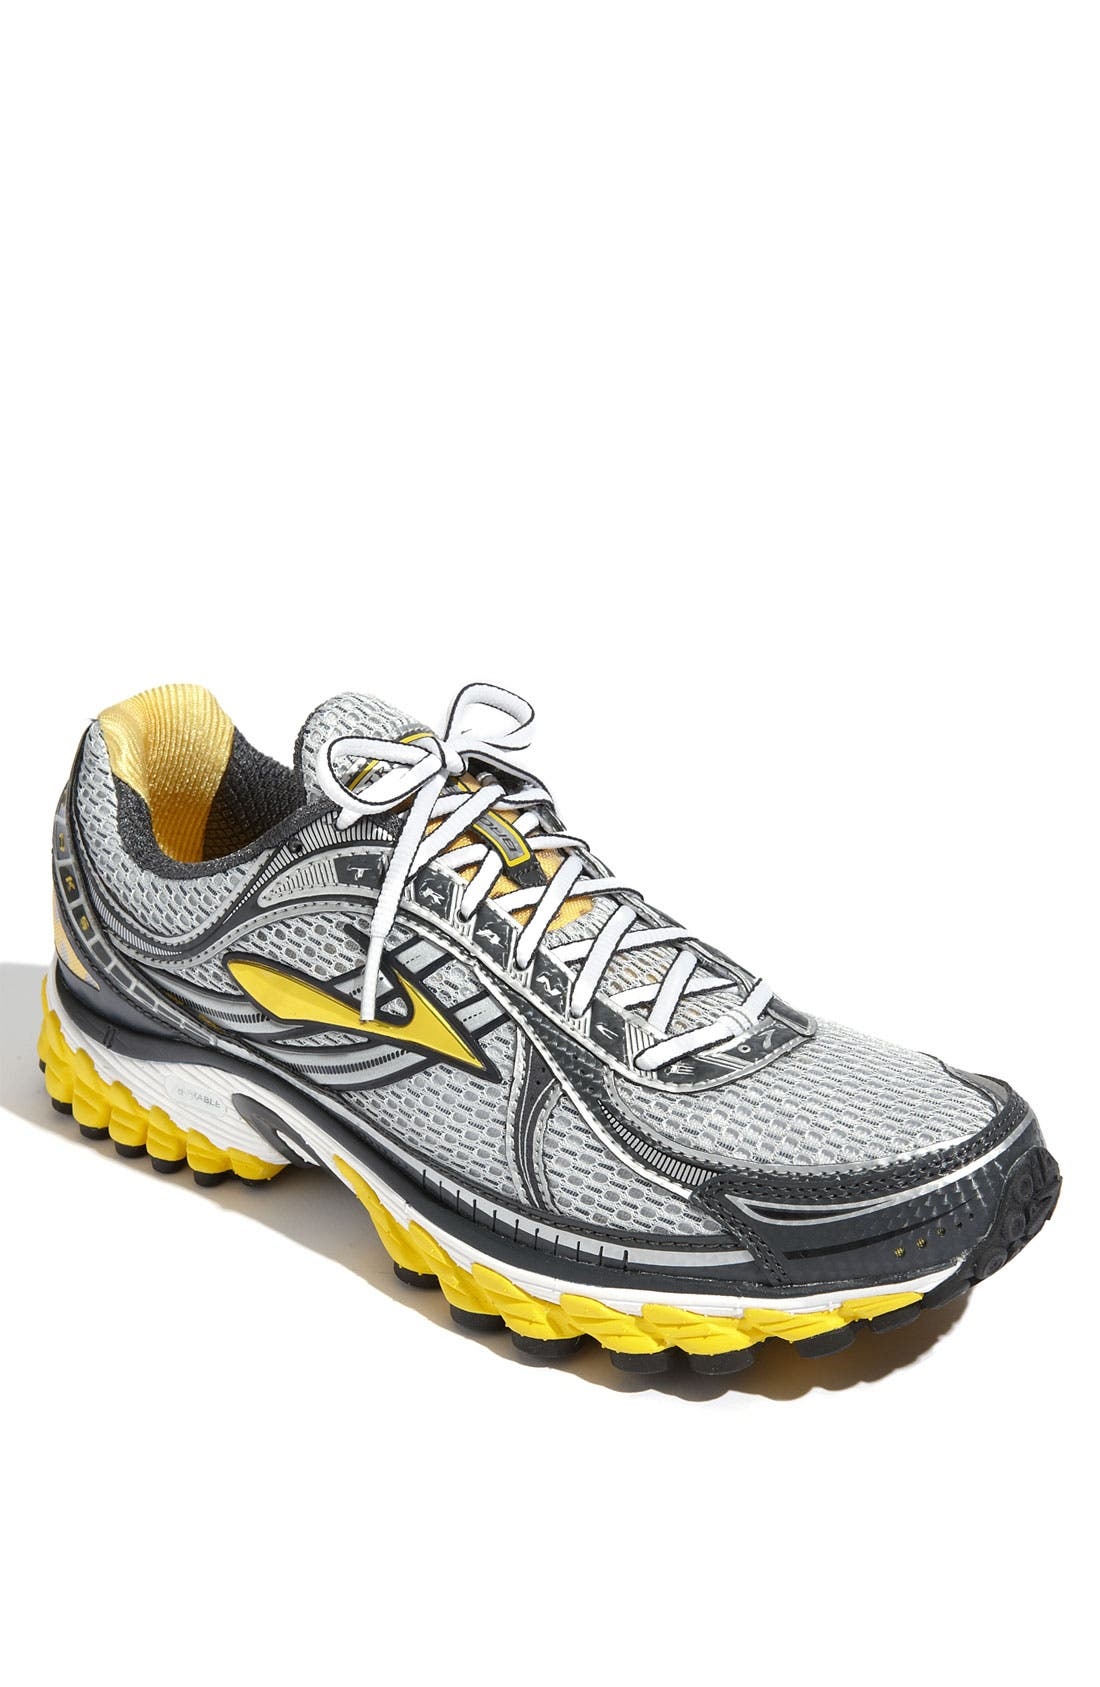 Alternate Image 1 Selected - Brooks 'Trance 11' Running Shoe (Men)